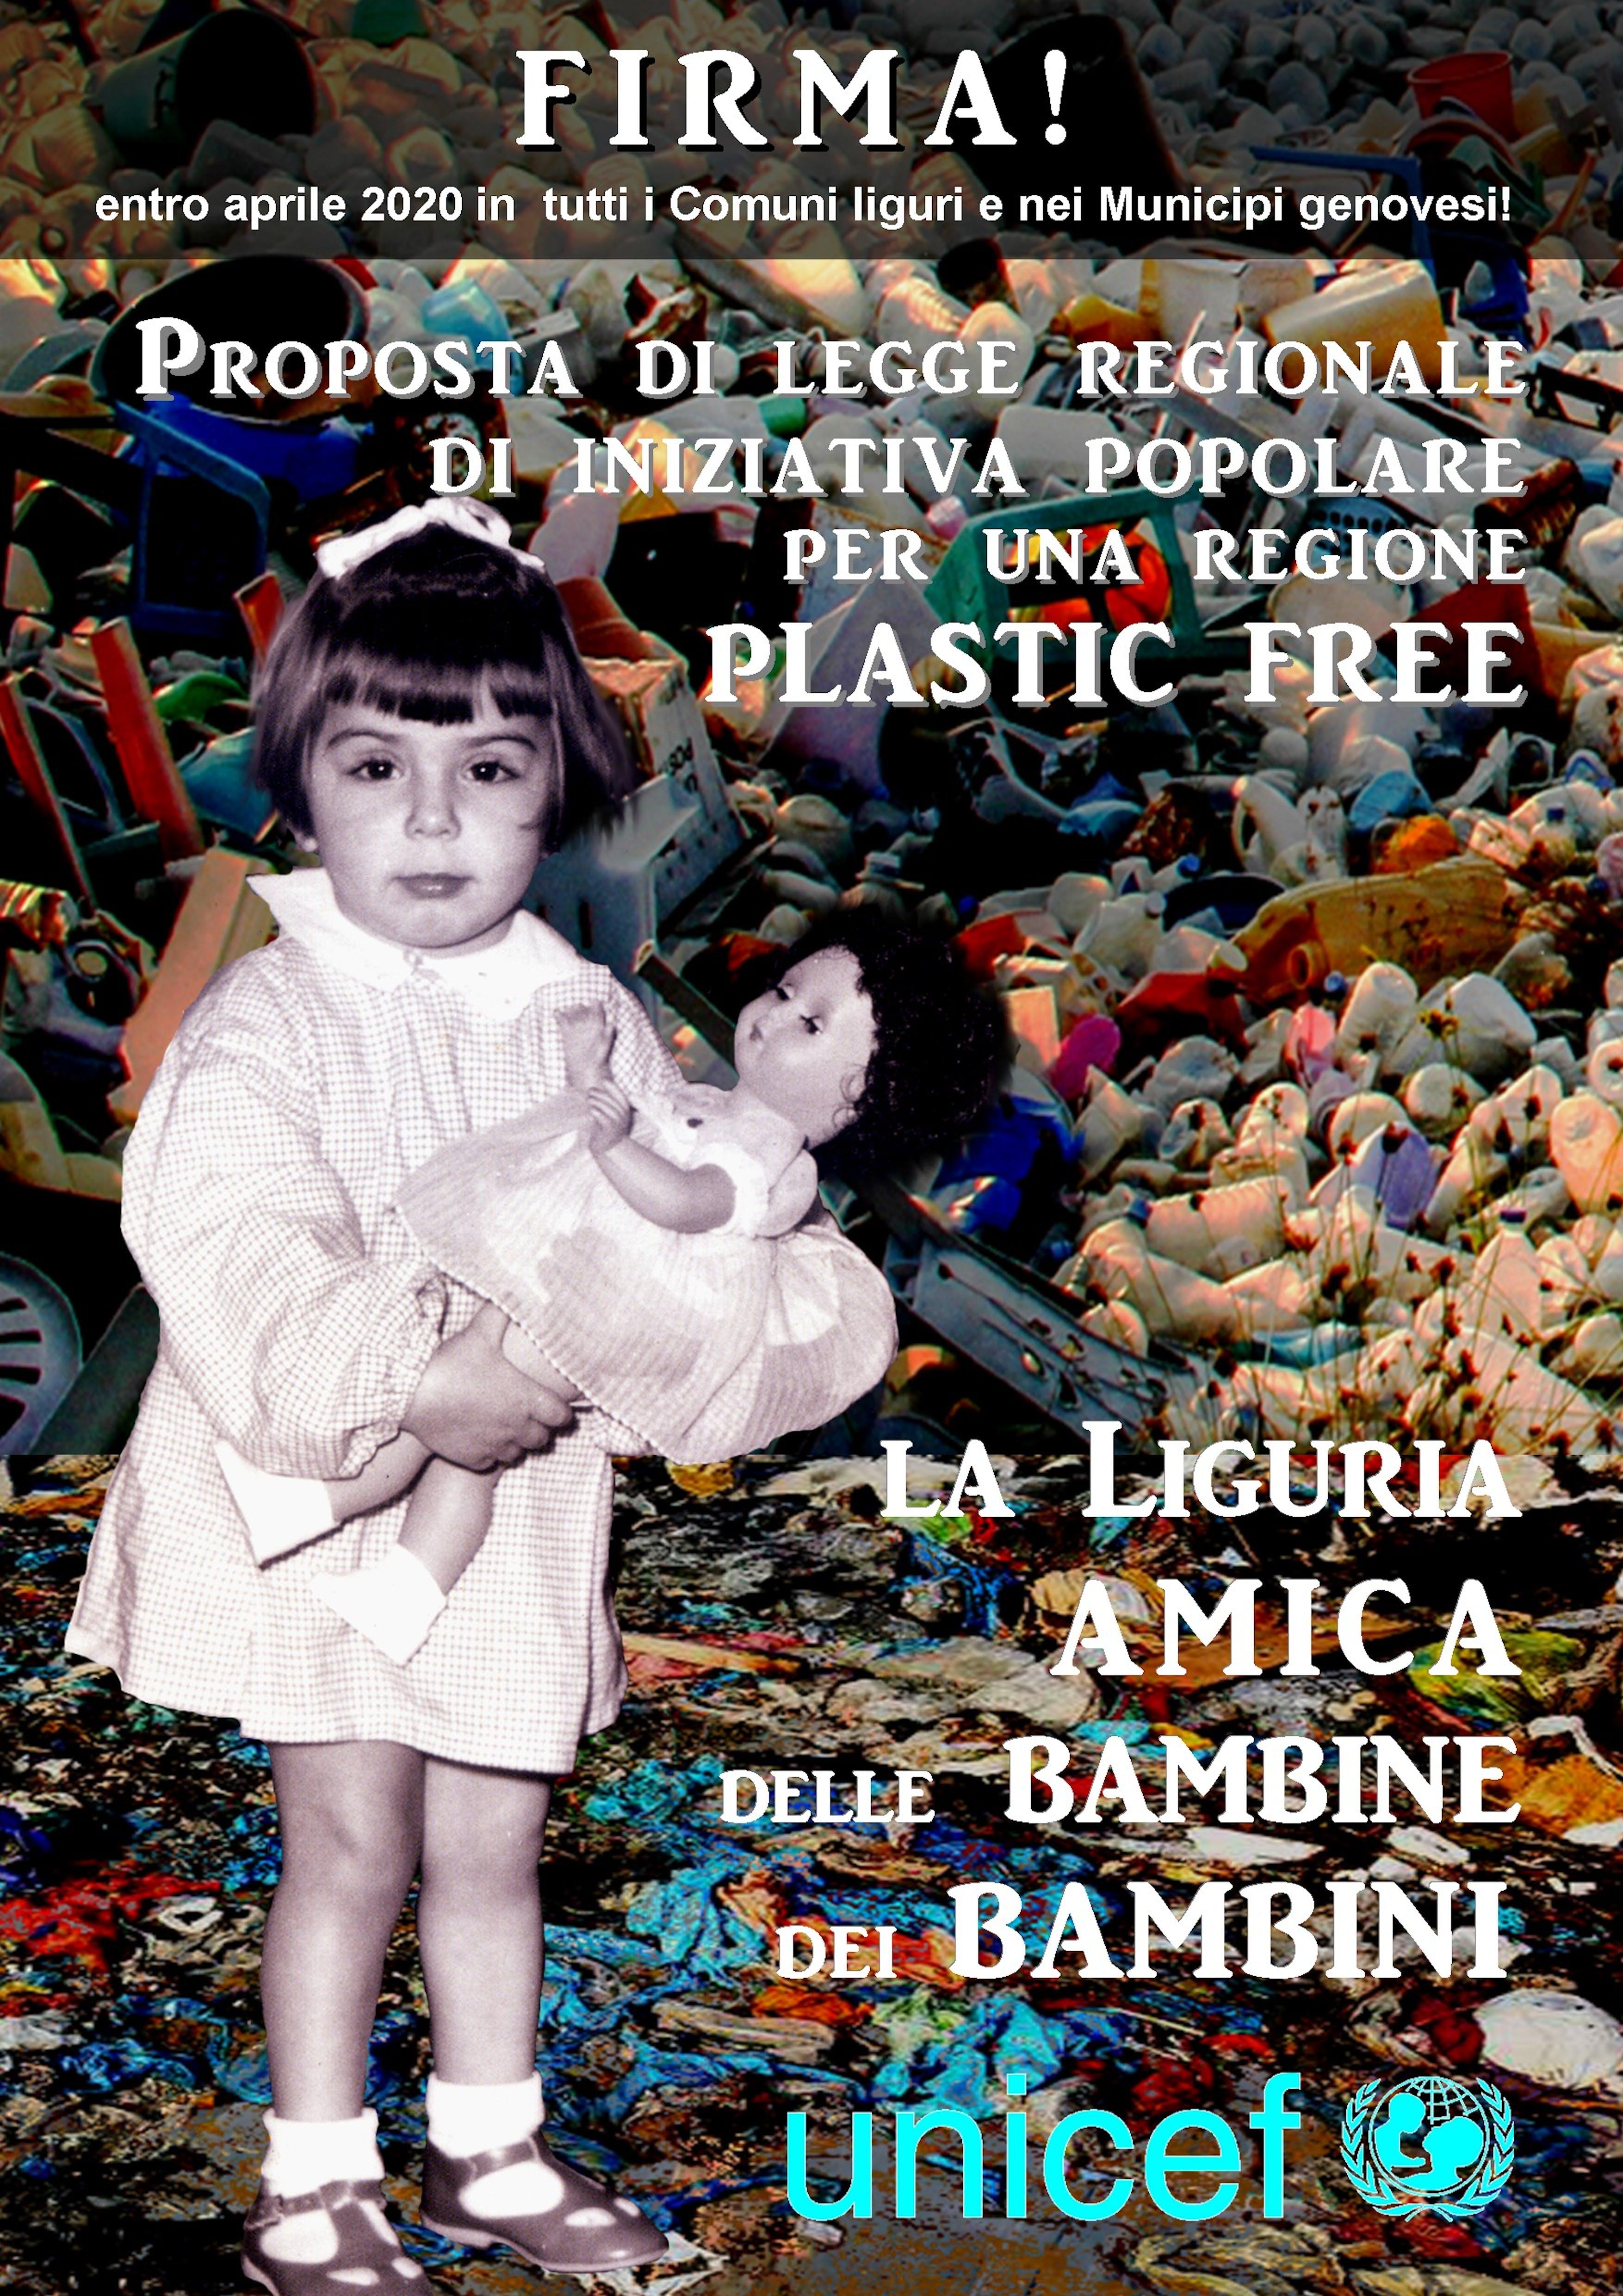 Firma per una Liguria plastic free!